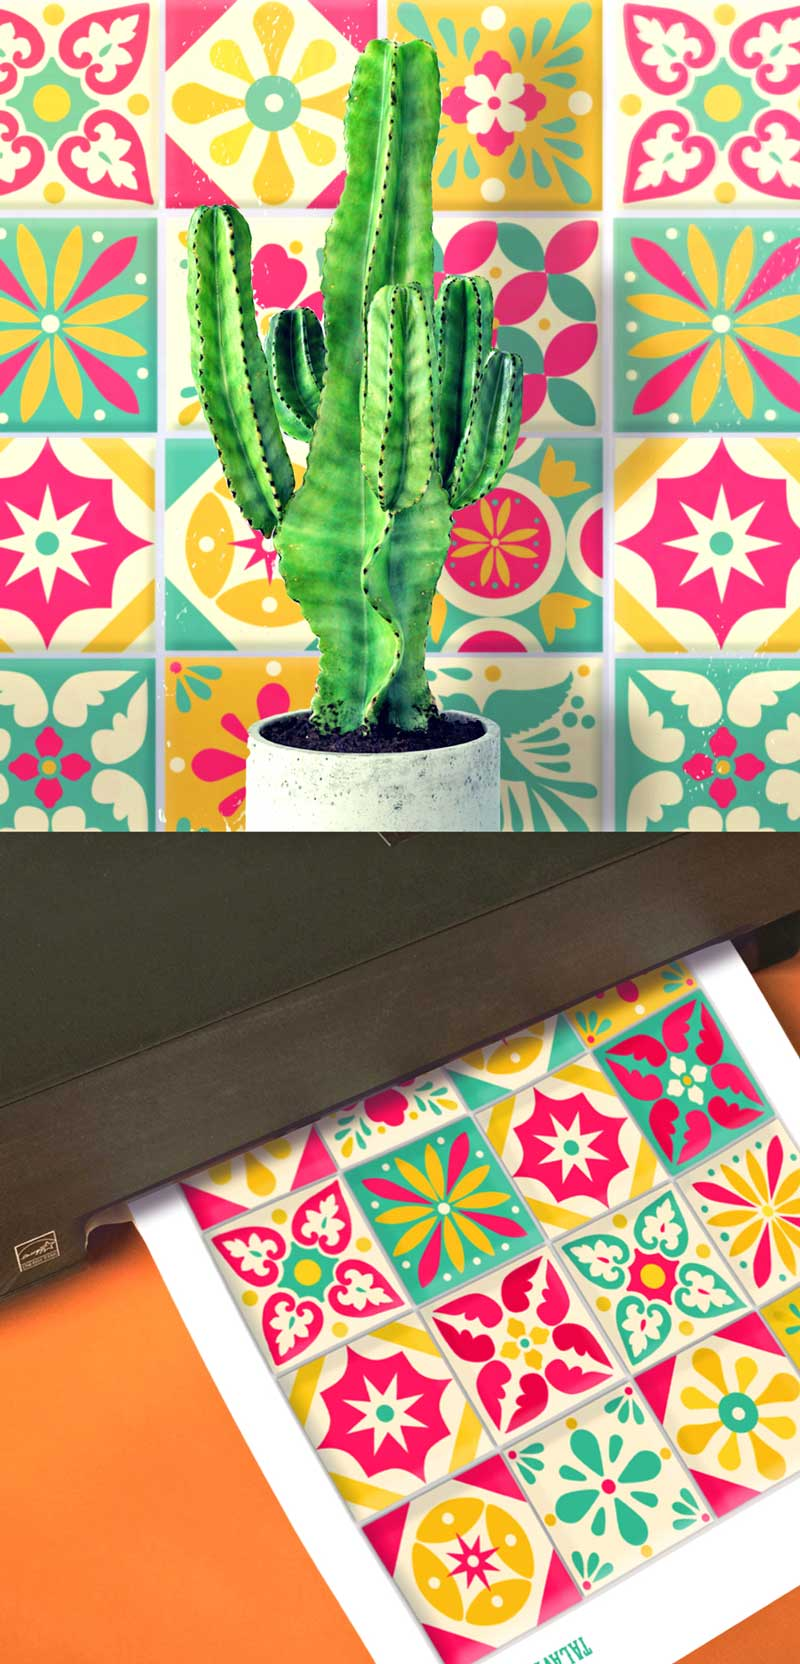 Printable DIY talavera tile designs and patterns-cactus